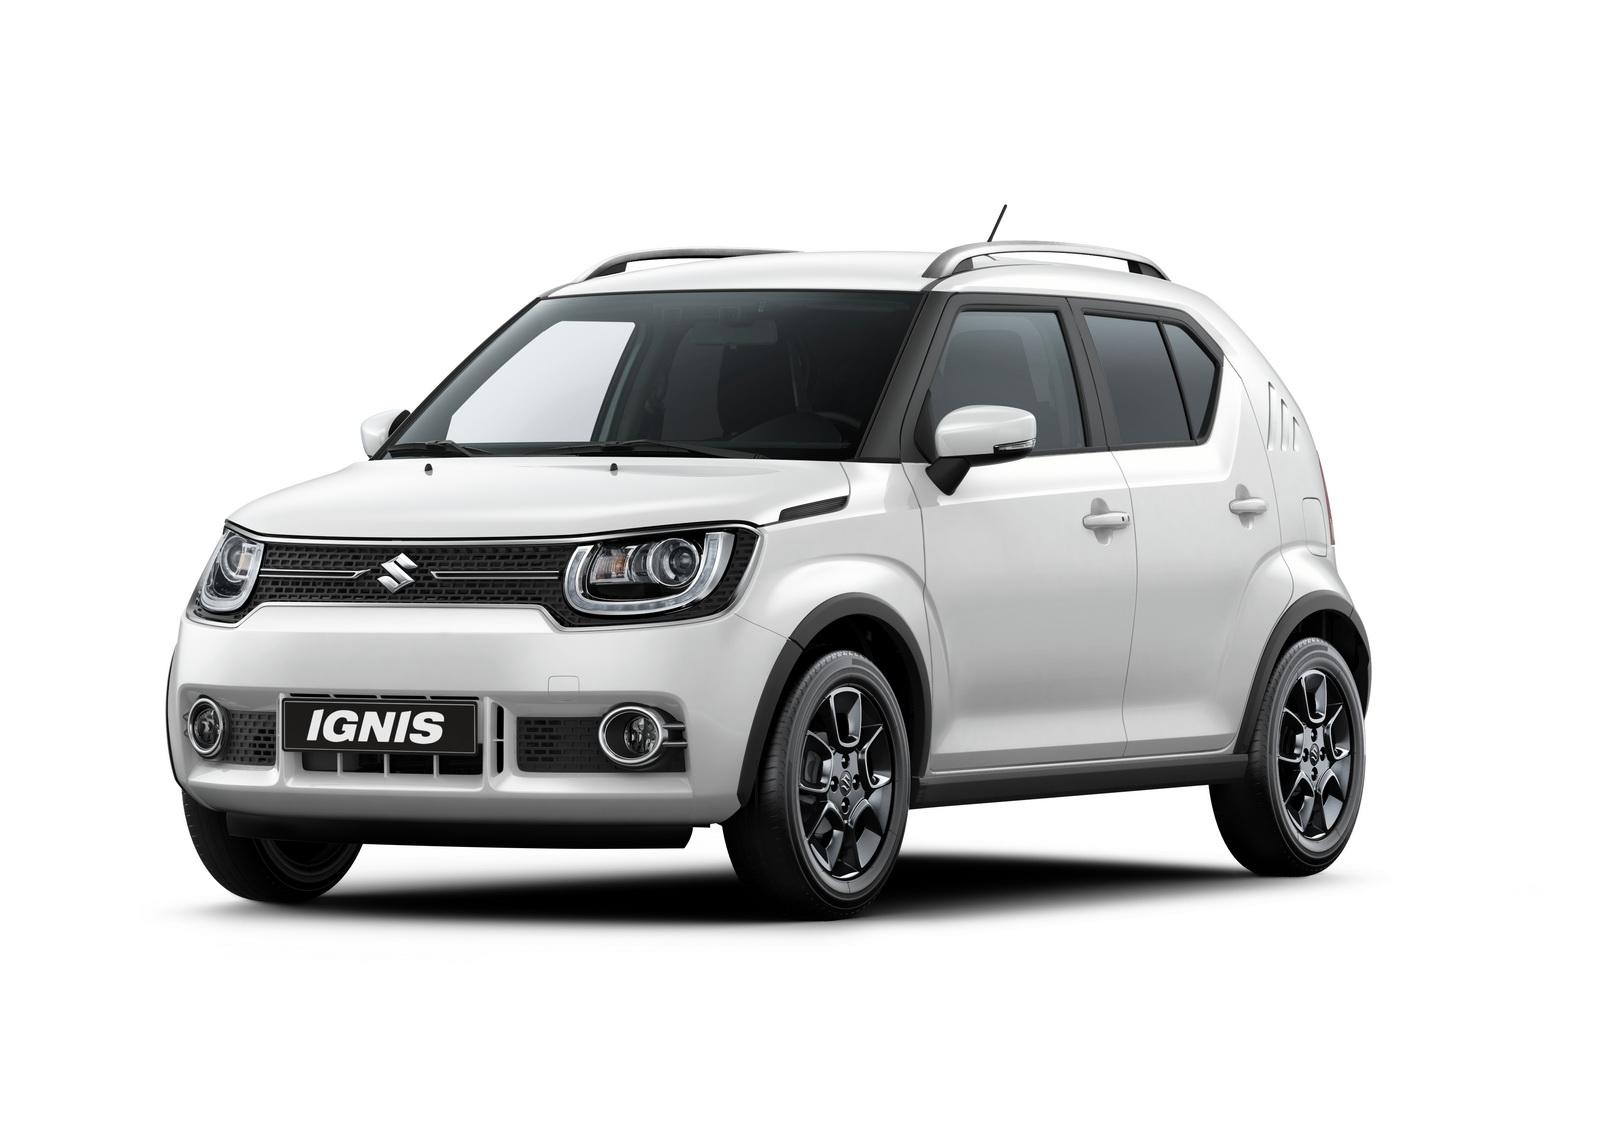 Berita Promo Harga Mobil Suzuki di Dealer Suzuki Karawaci